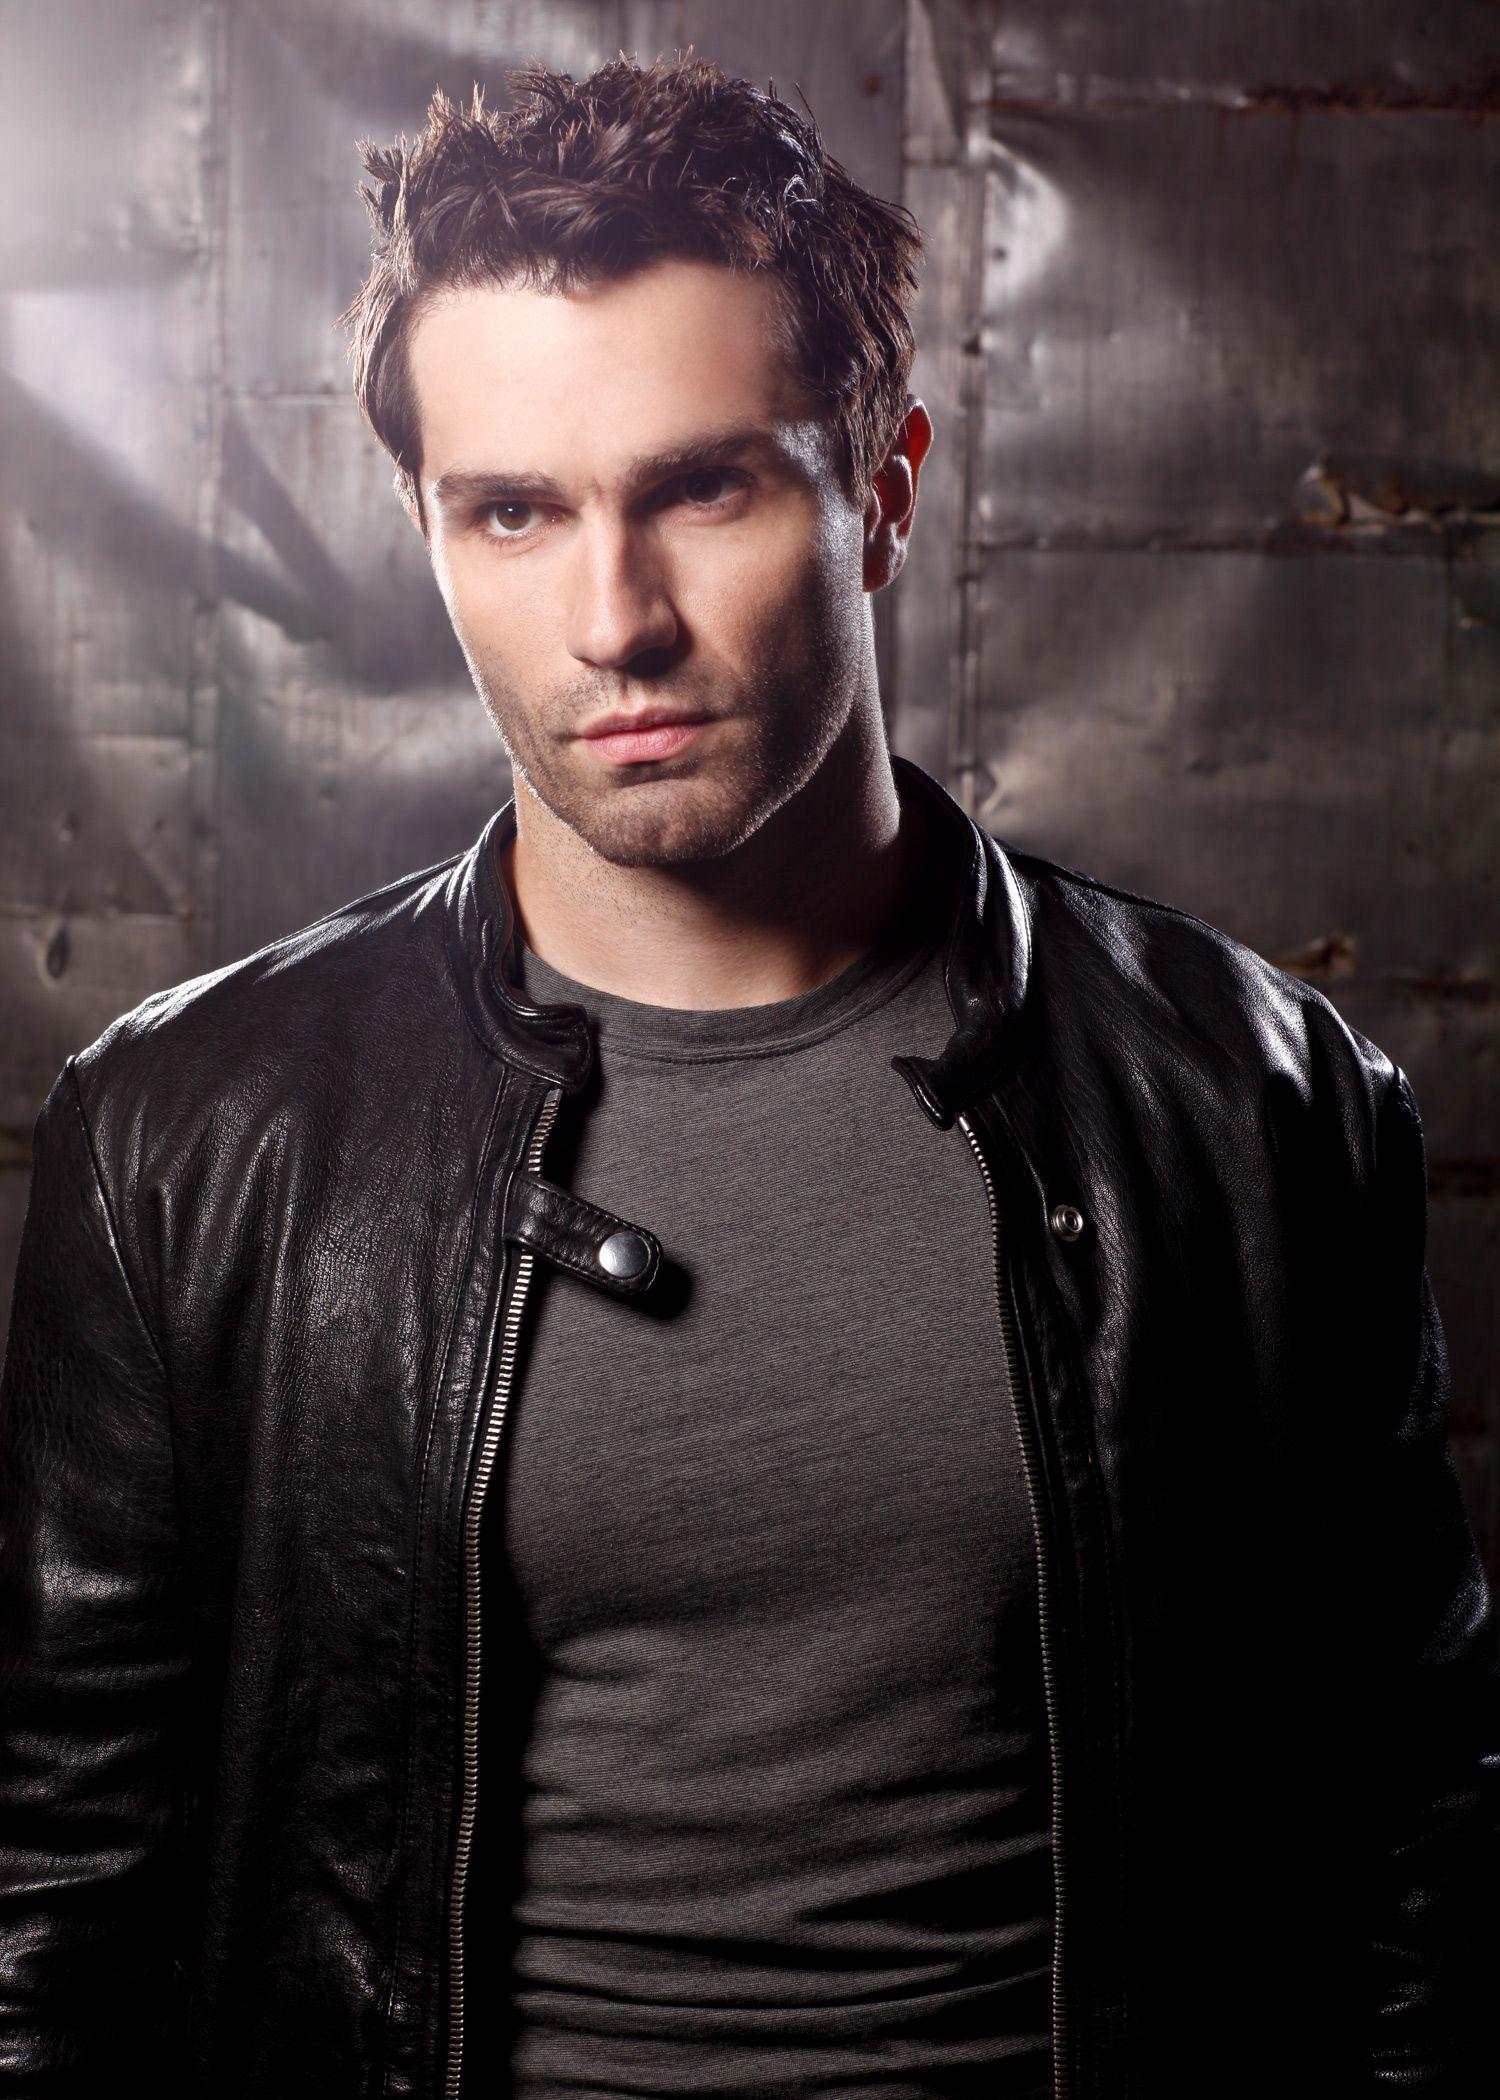 Sam Witwer handsome hot sexy celebrity hunk Scruffy